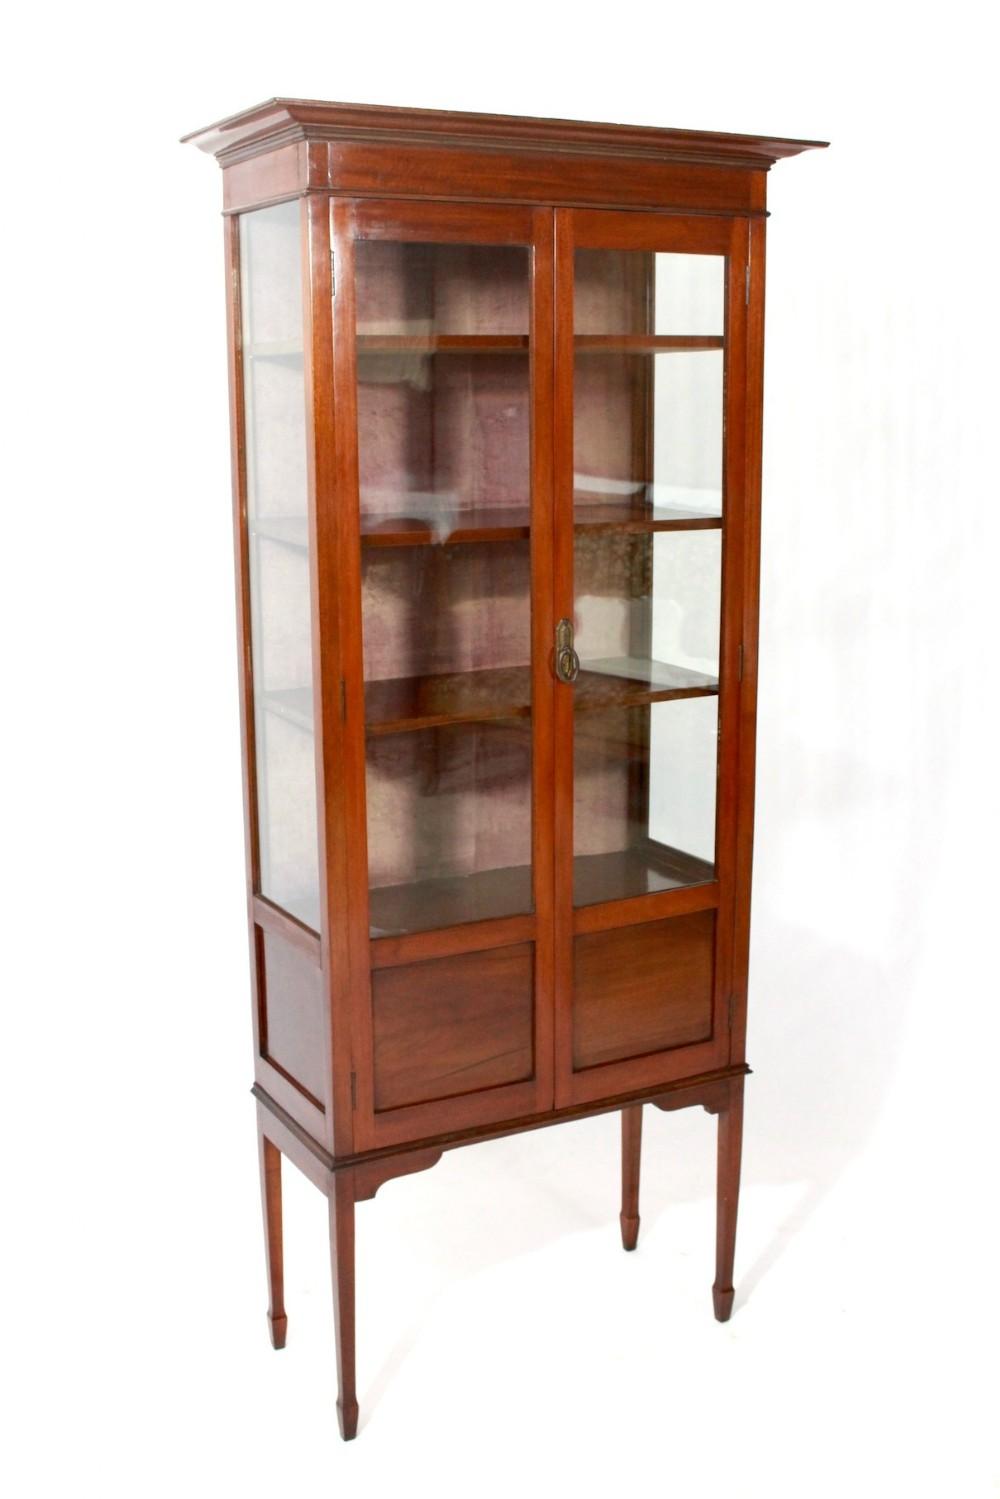 antique edwardian mahogany display cabinet - Antique Edwardian Mahogany Display Cabinet 307499